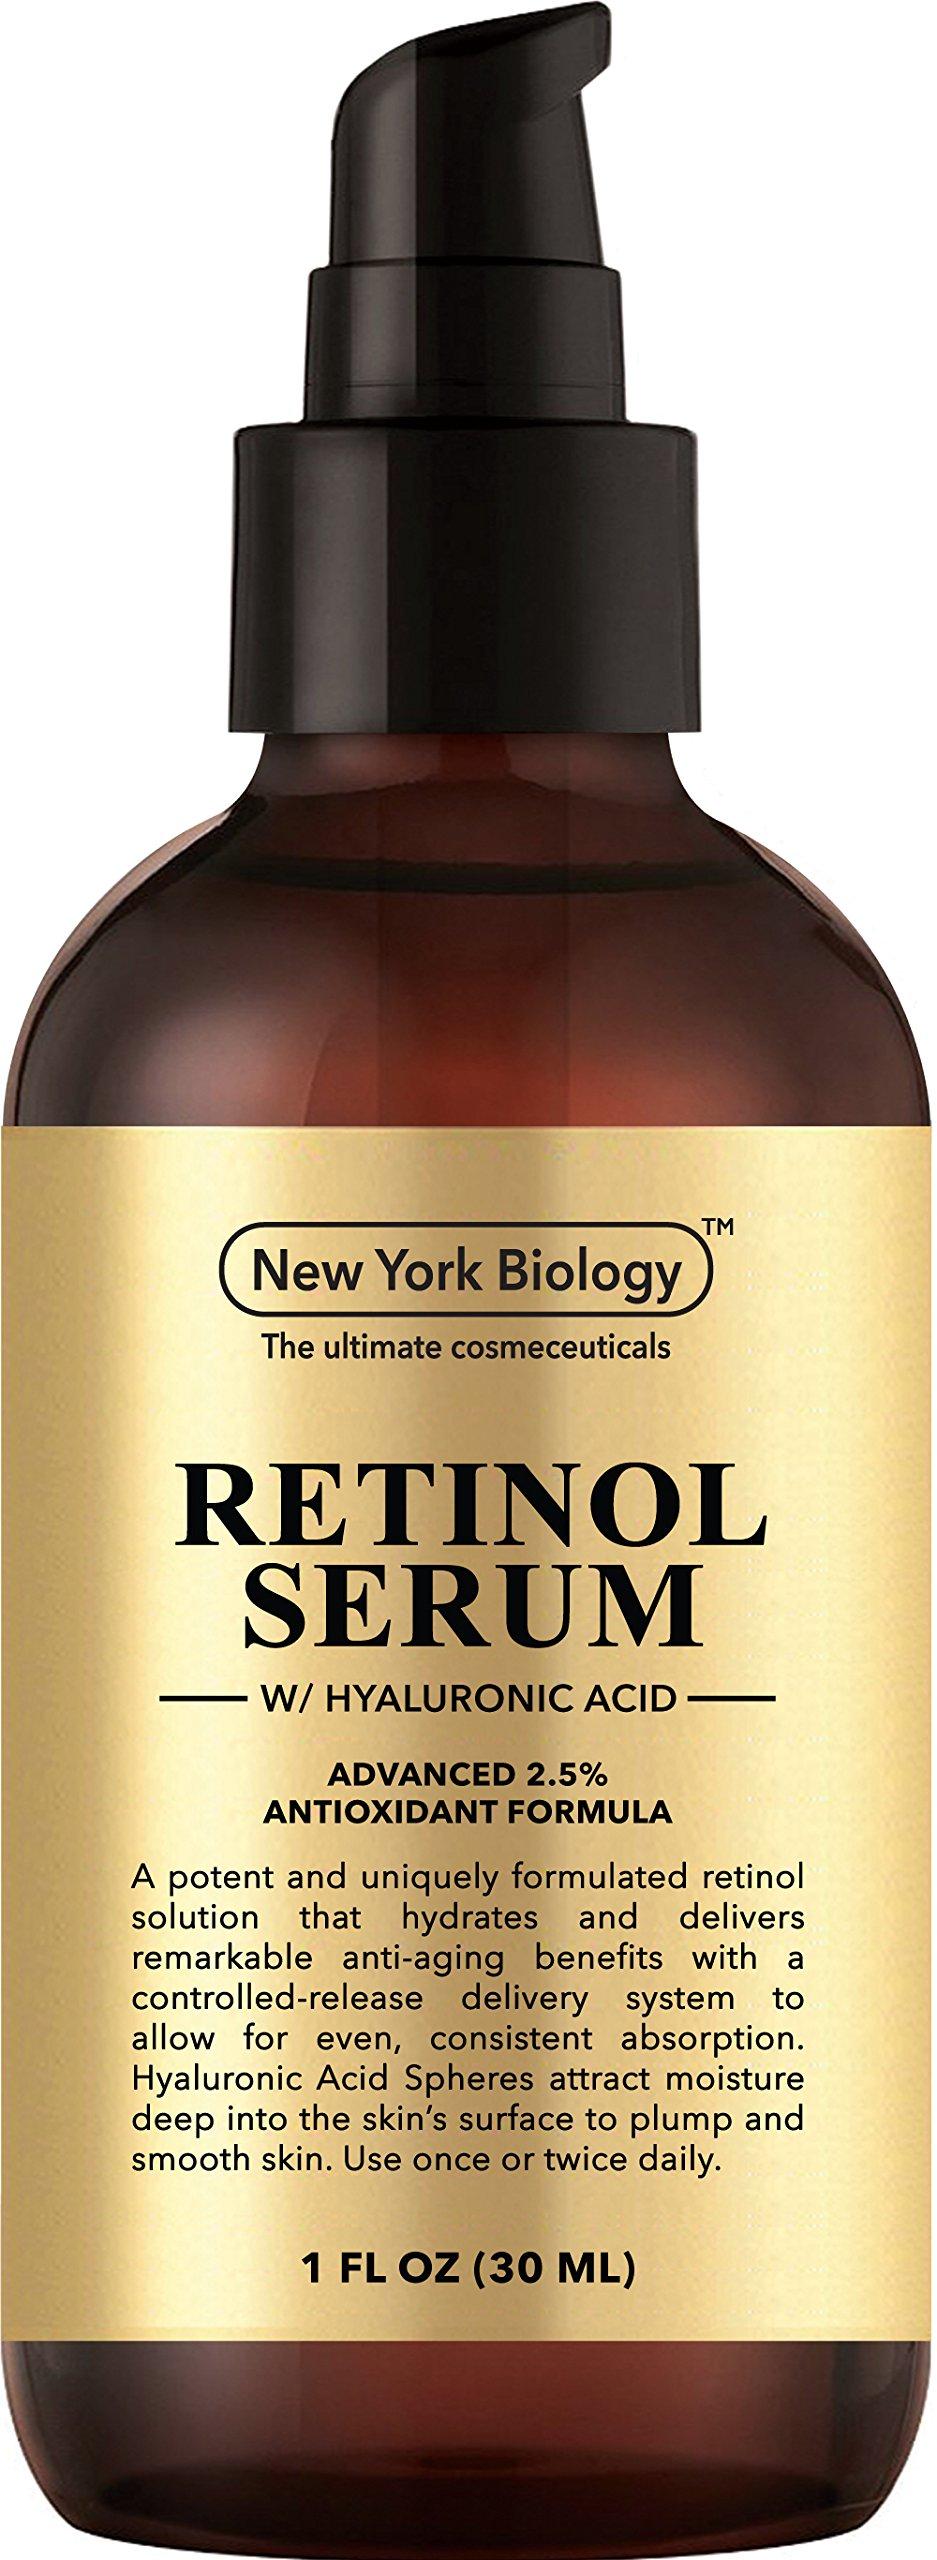 Super Retinol Serum 2.5% w/Hyaluronic Acid – Professional Grade – Anti Aging Face Serum For Wrinkles, Fine Lines And Hyperpigmentation – 6X Stronger than Retinol Cream Moisturizers - 1 FL OZ